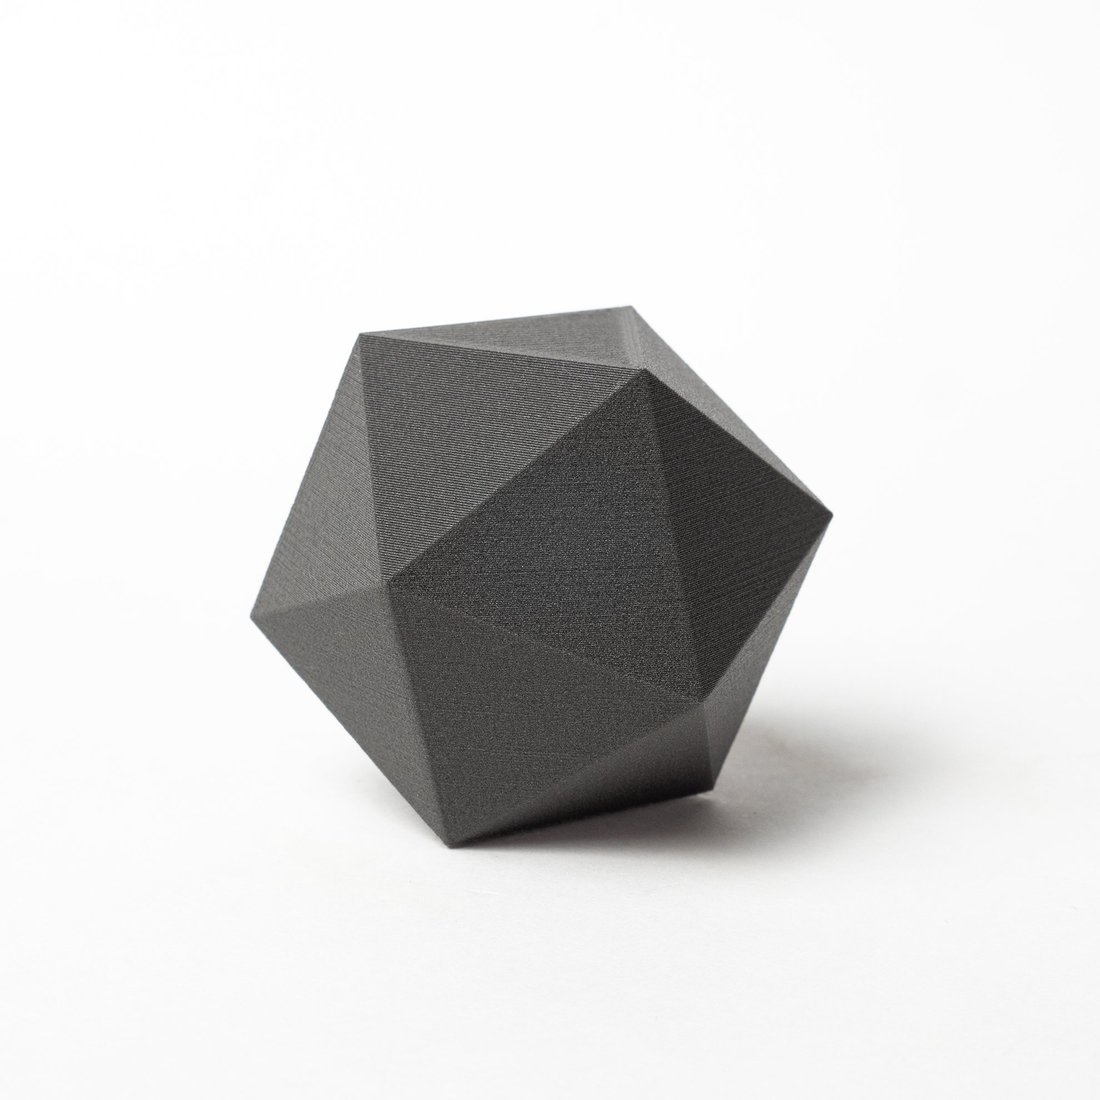 Proto-pasta 2.85 mm Magnetic Iron PLA filament, Black